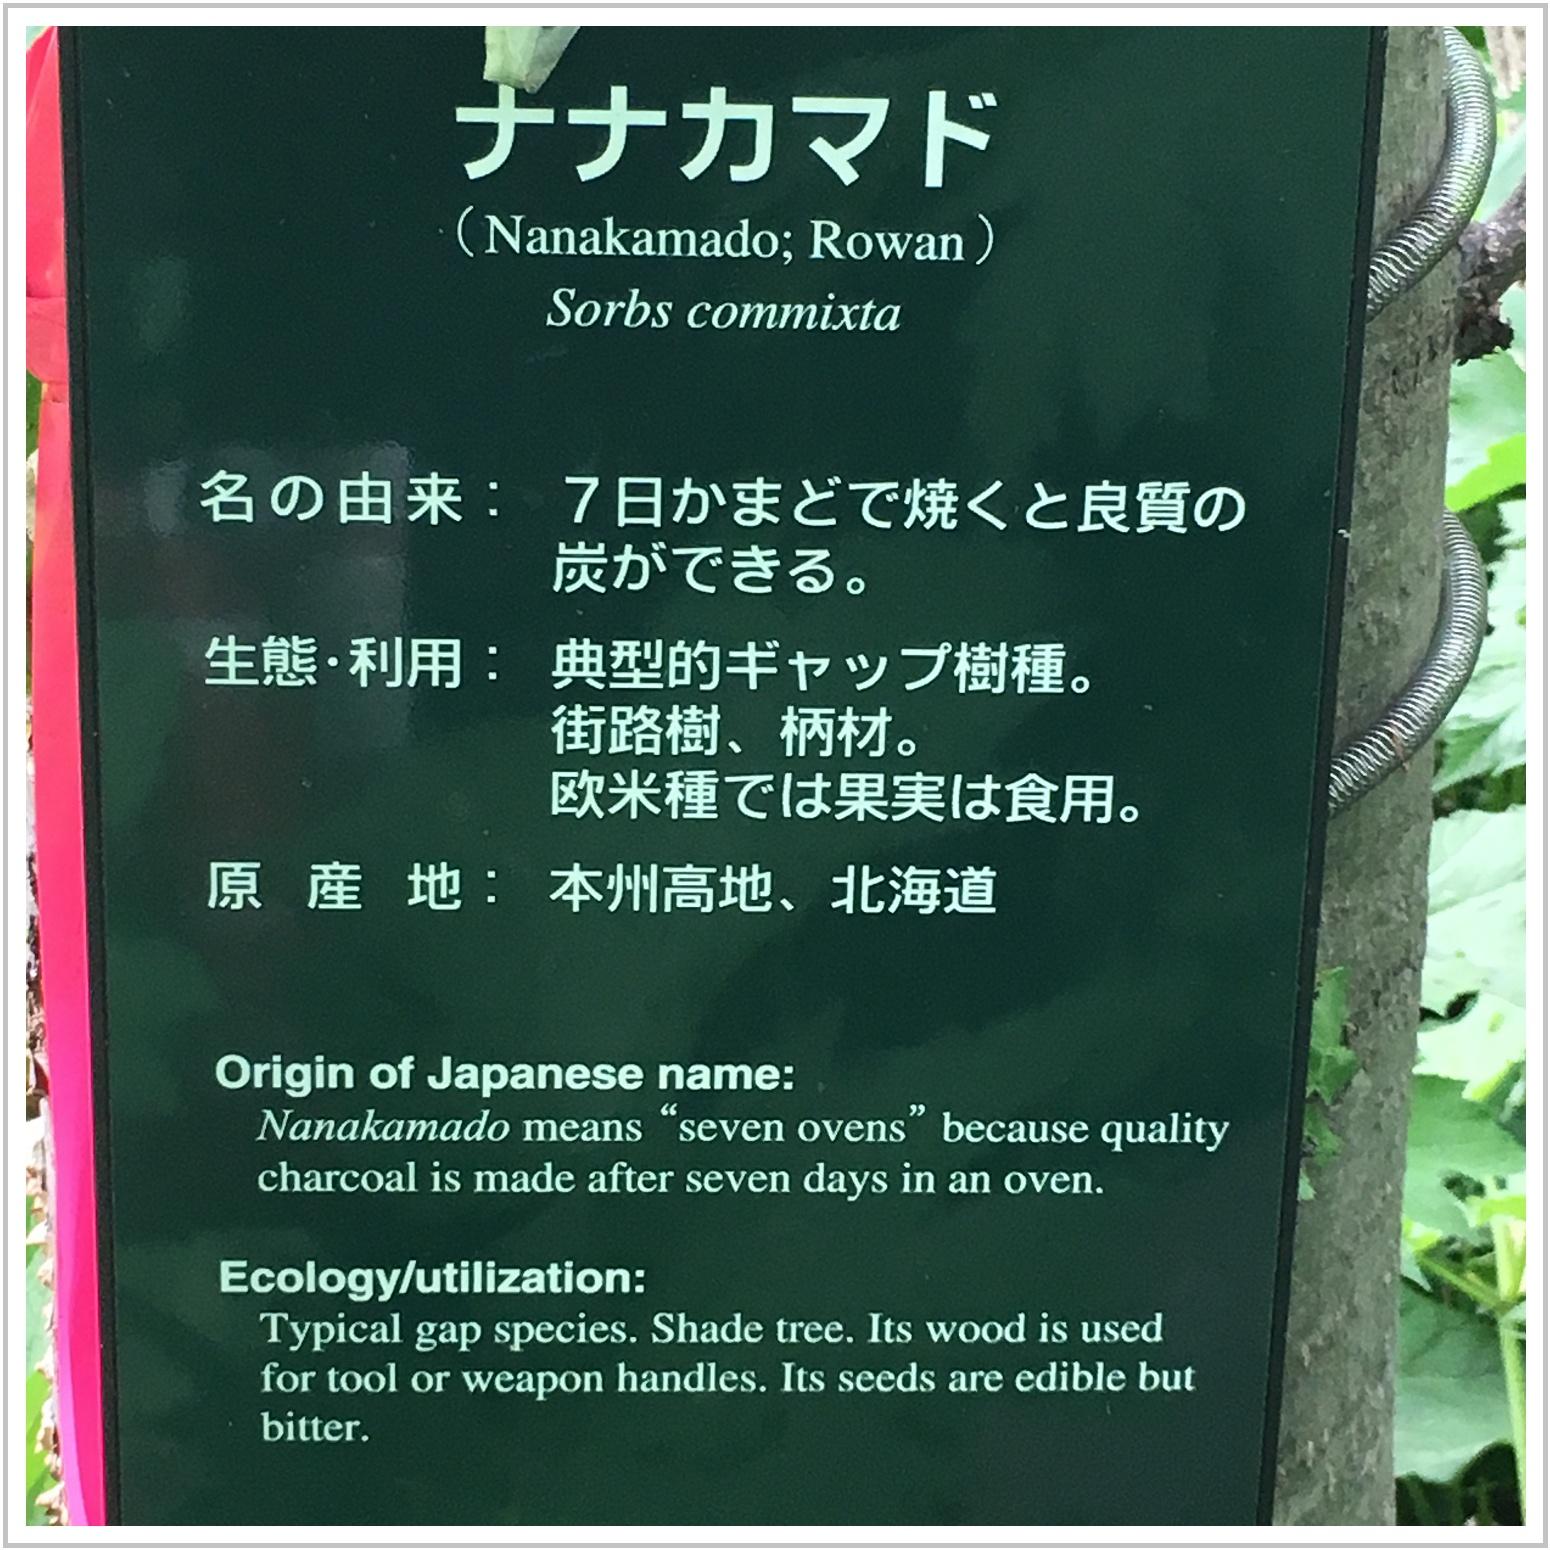 nanakamado_4_527.jpg